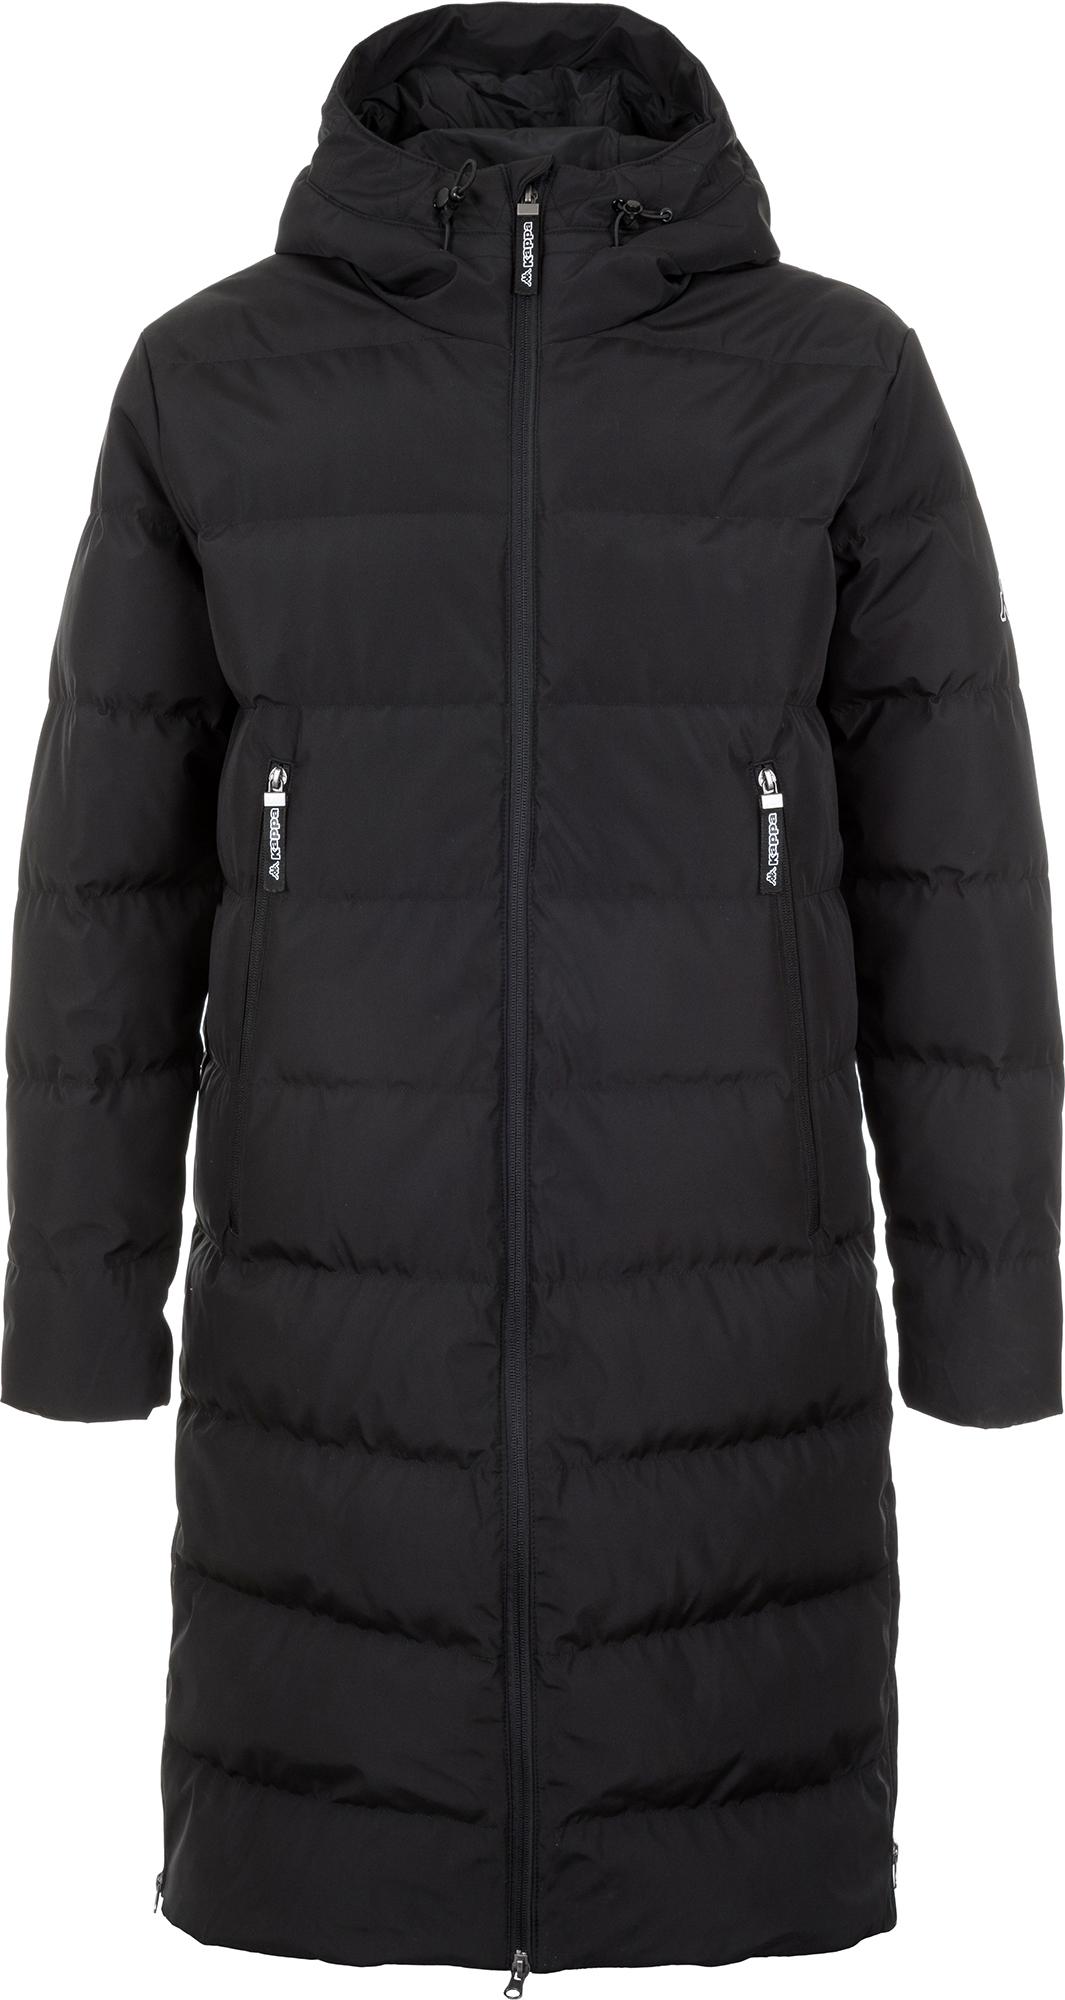 Kappa Куртка пуховая мужская Kappa, размер 52